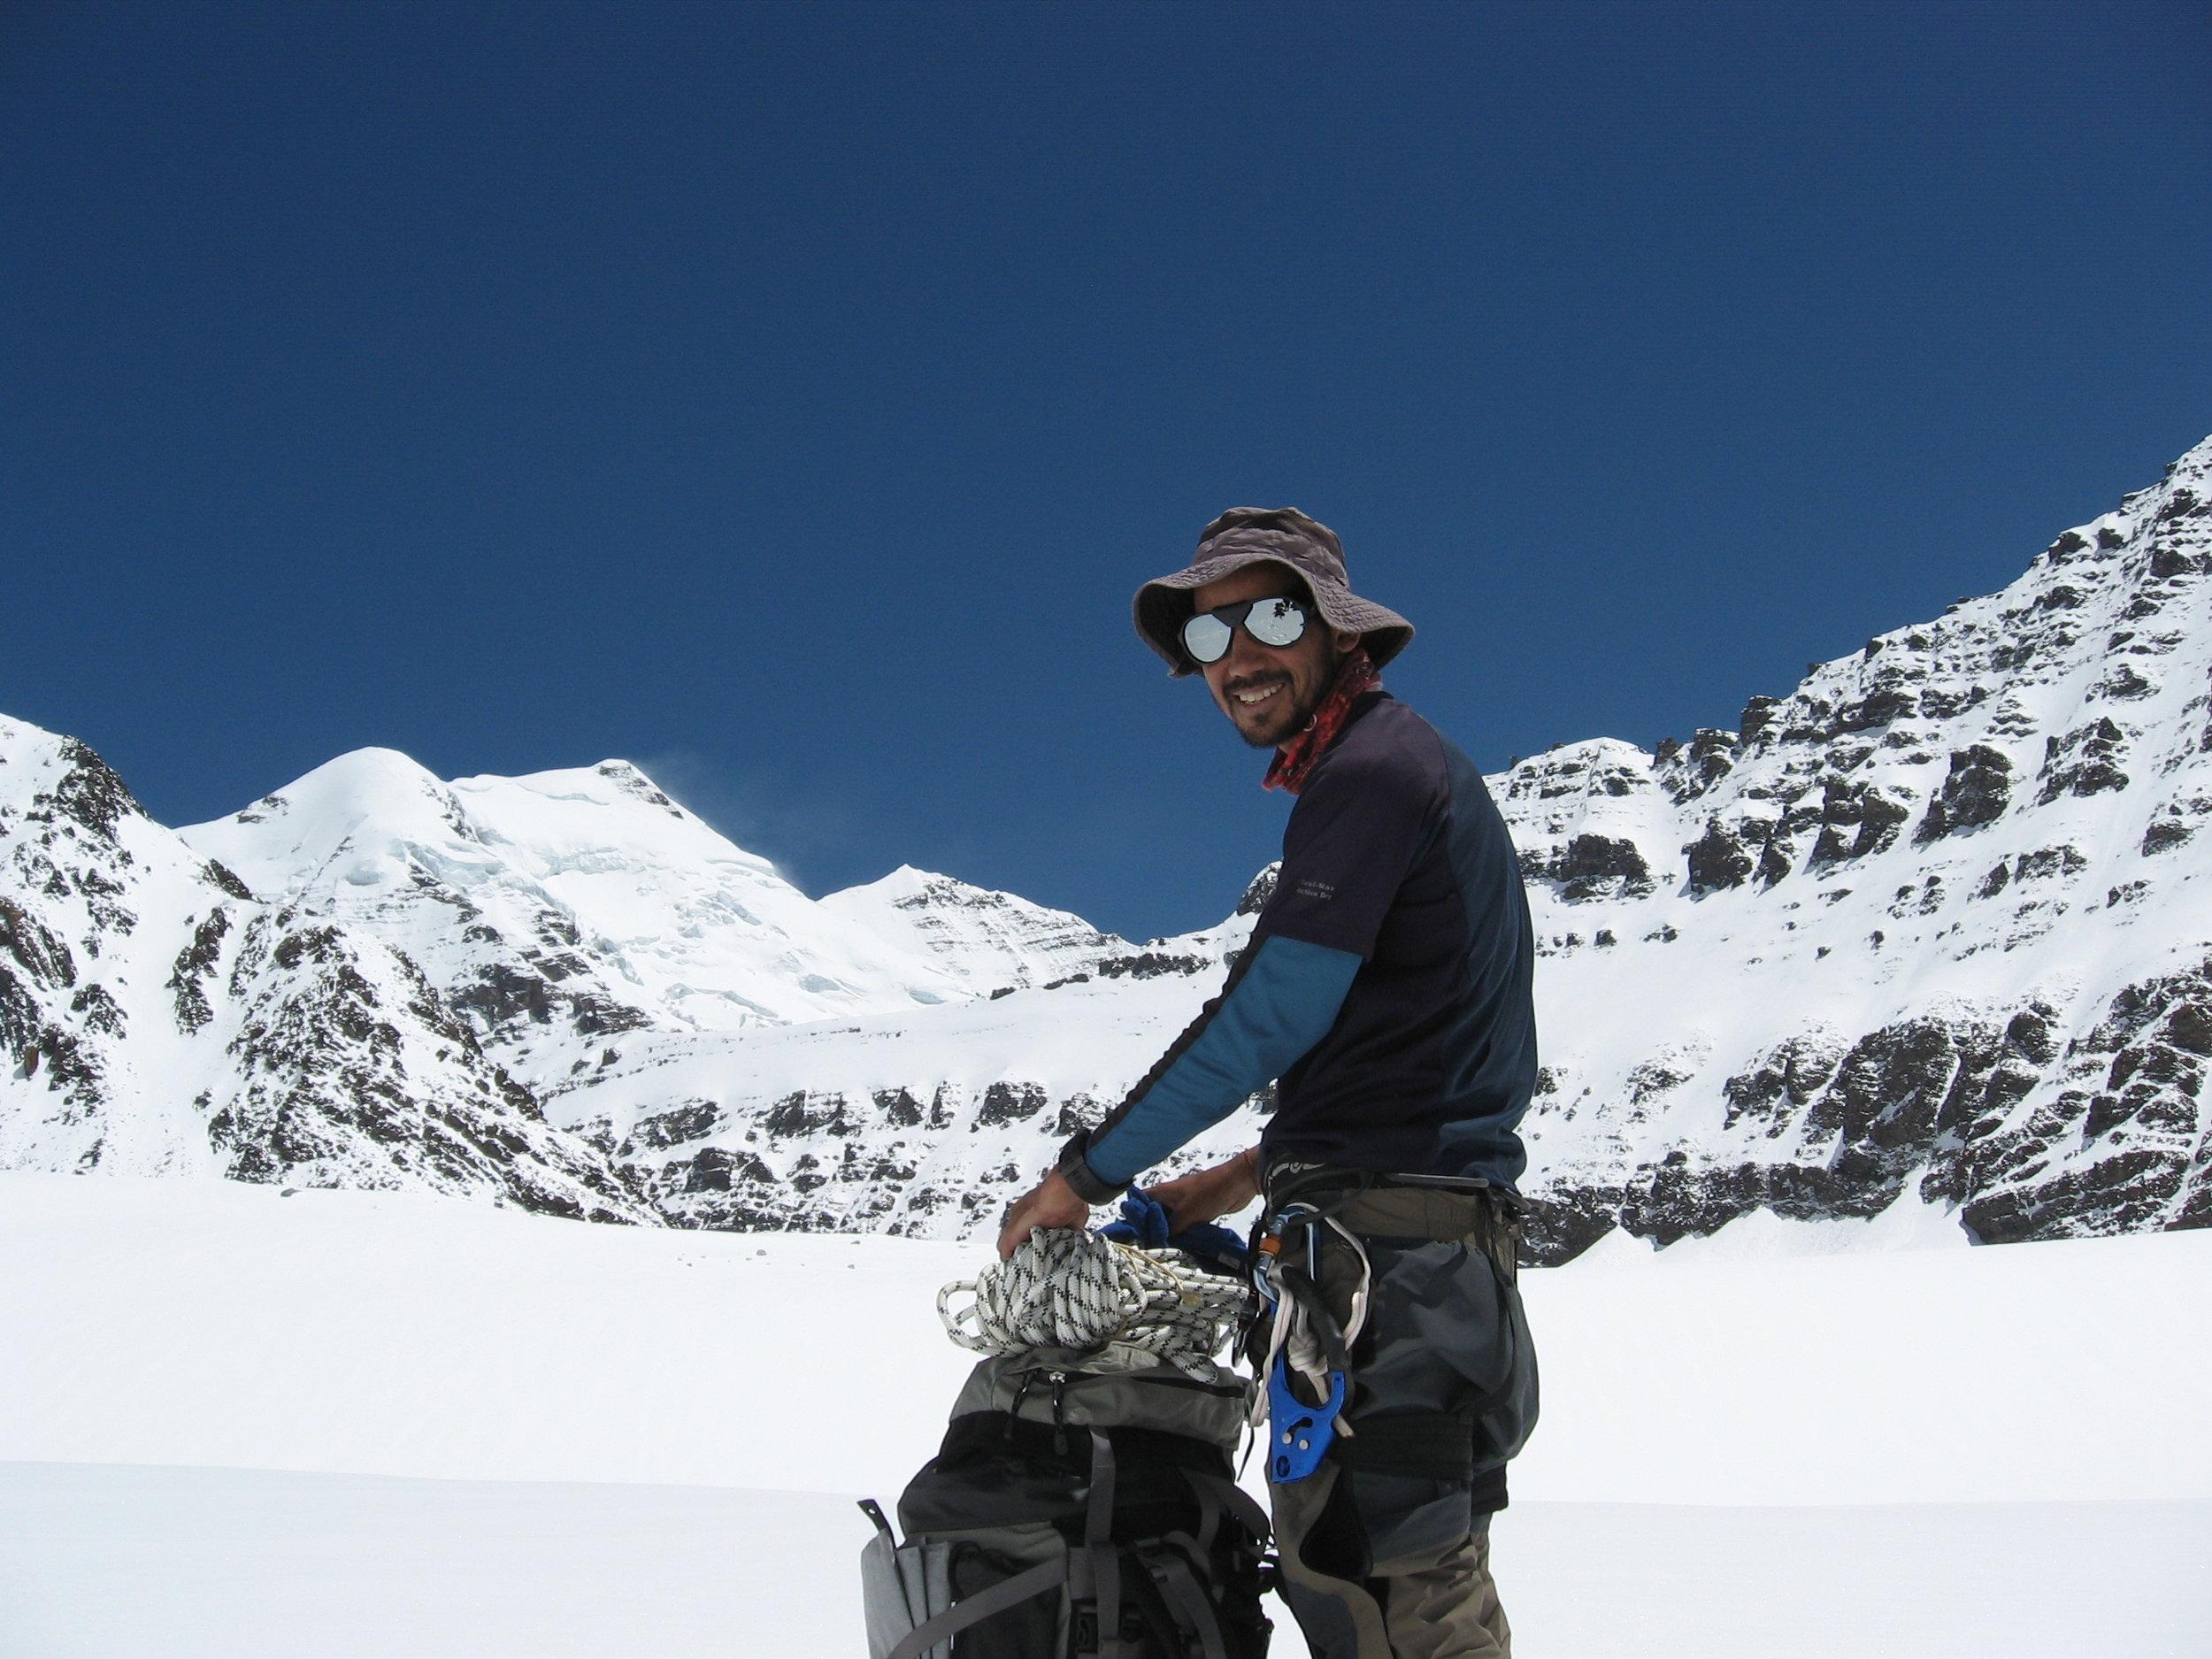 Avilash Bisht, River + Trek/Climb Guide